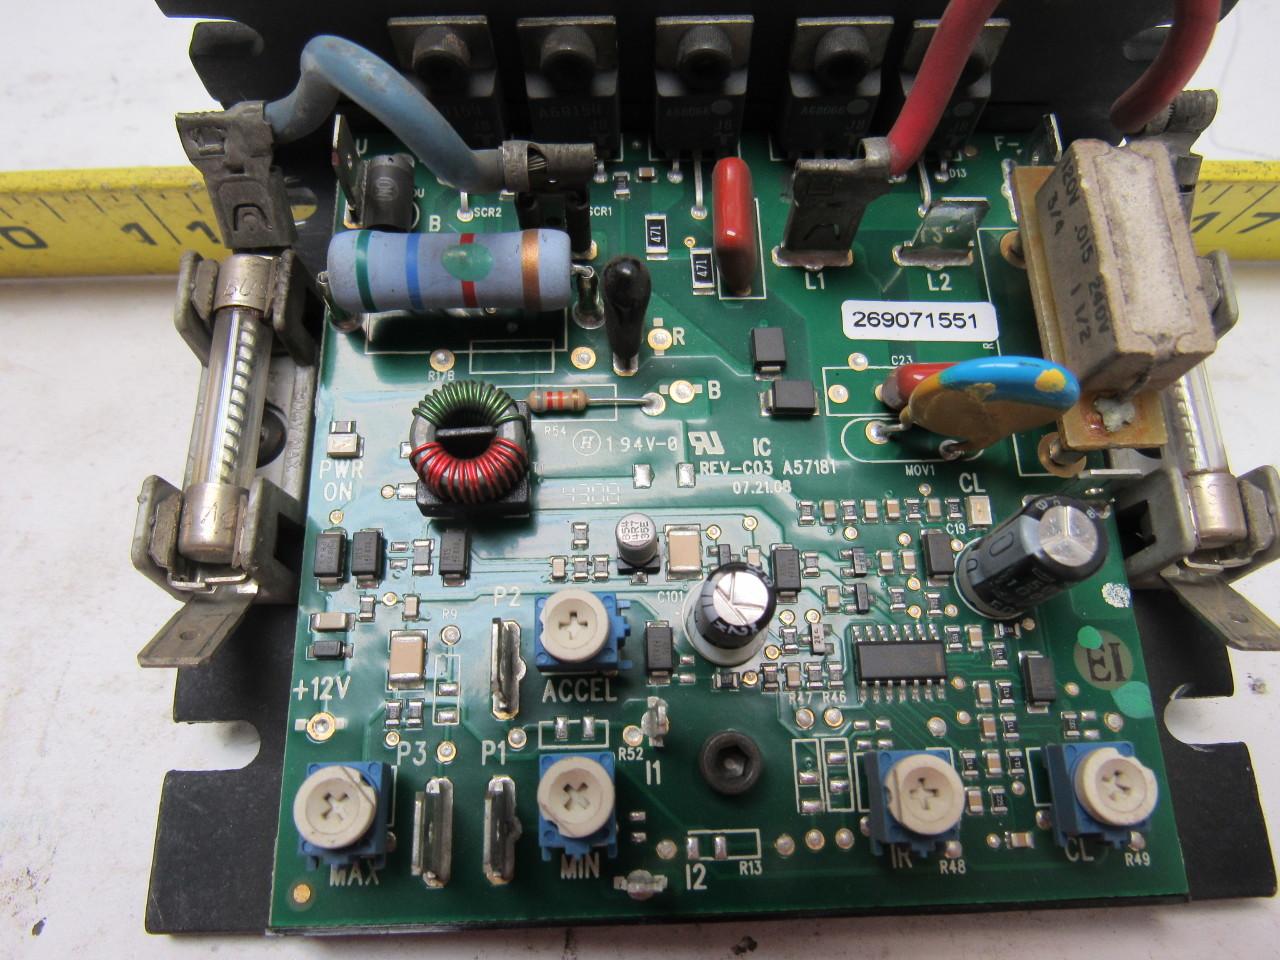 Kbic 120 Wiring Diagram Kb Electronics 9429h Dc Motor Speed Control In